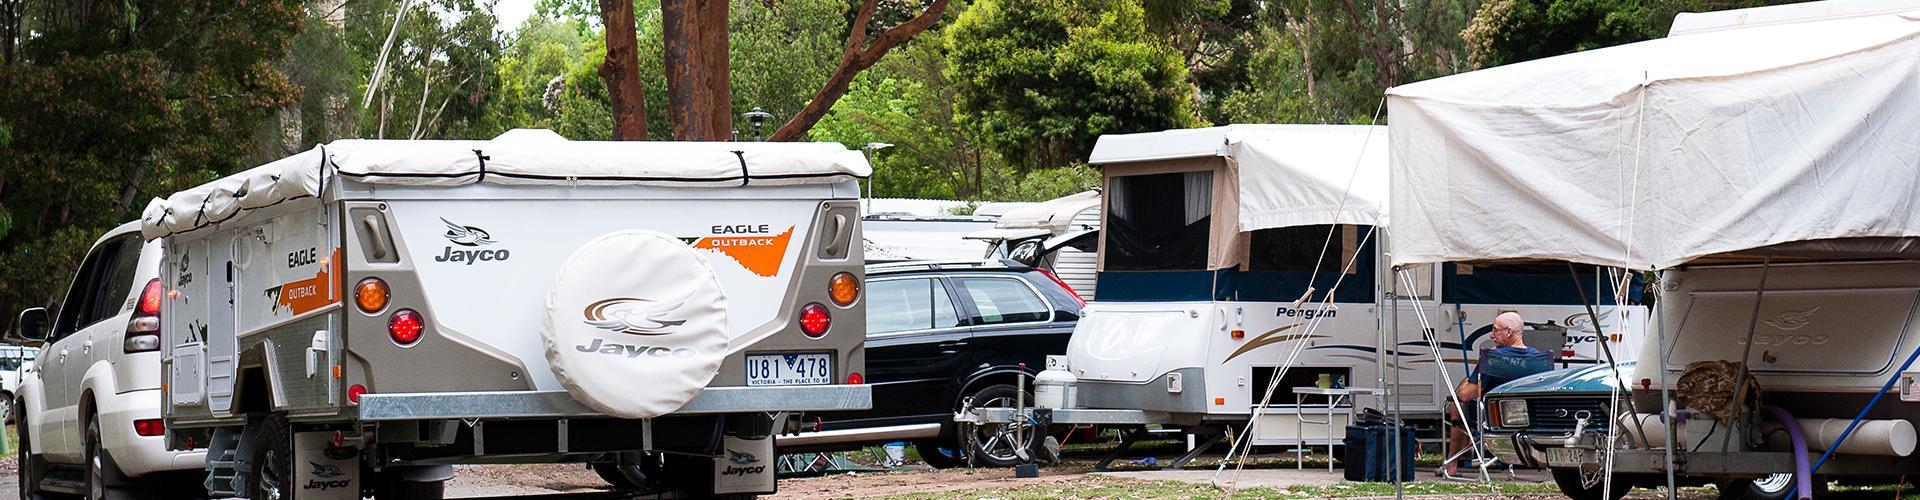 BIG4 Yarra Valley Park Lane Holiday Park - Powered Caravan and Motorhome sites - Car Driving in